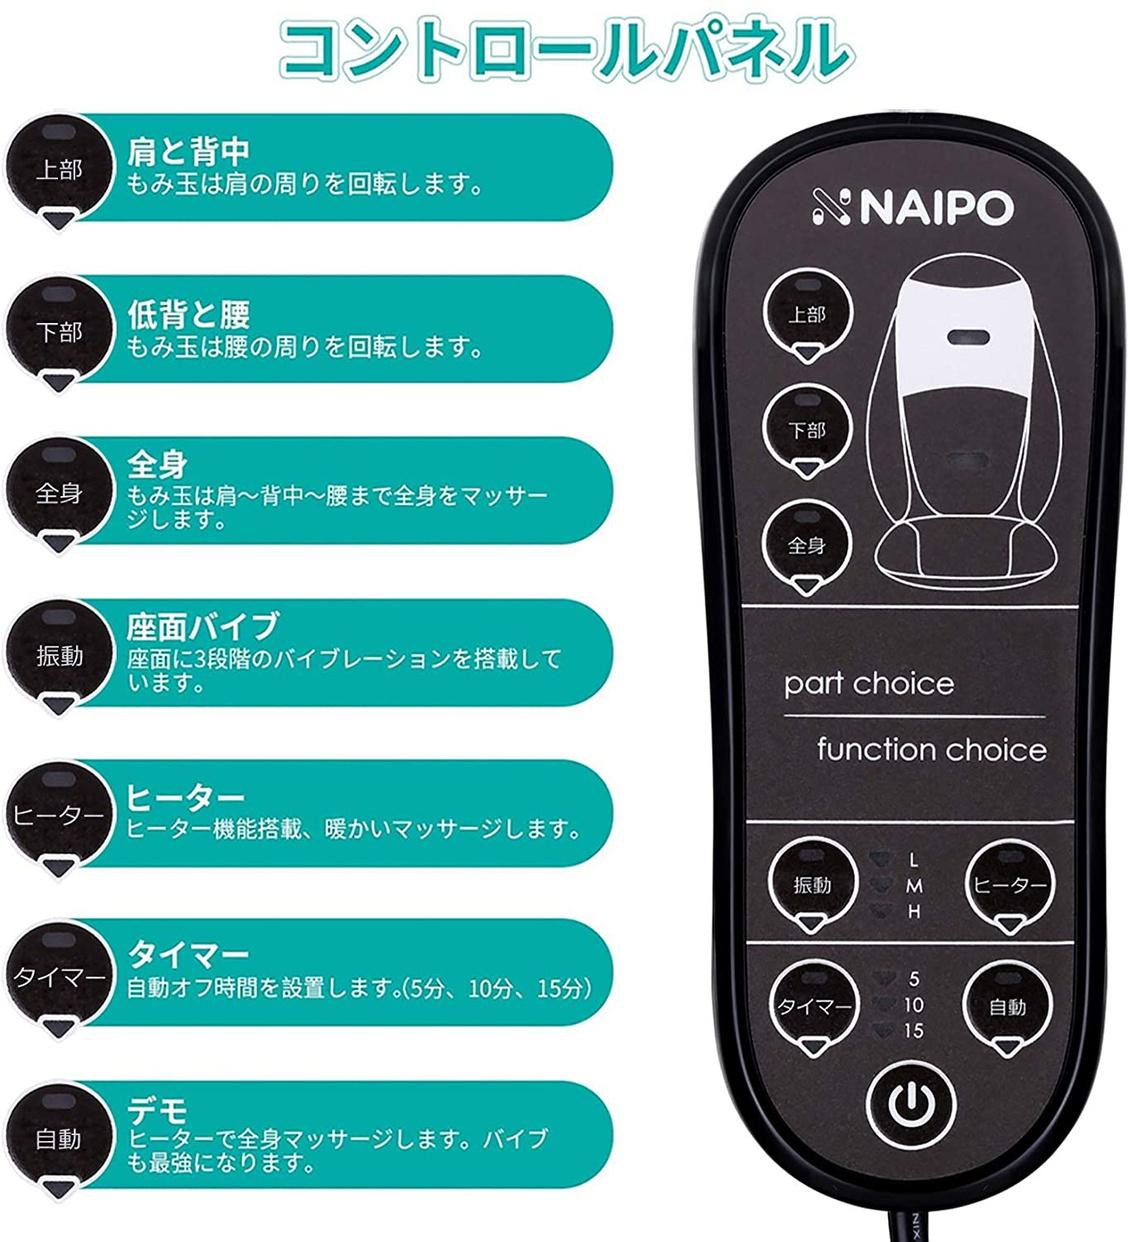 Naipo(ナイポ) マッサージシート MGBK-2606Hの商品画像5